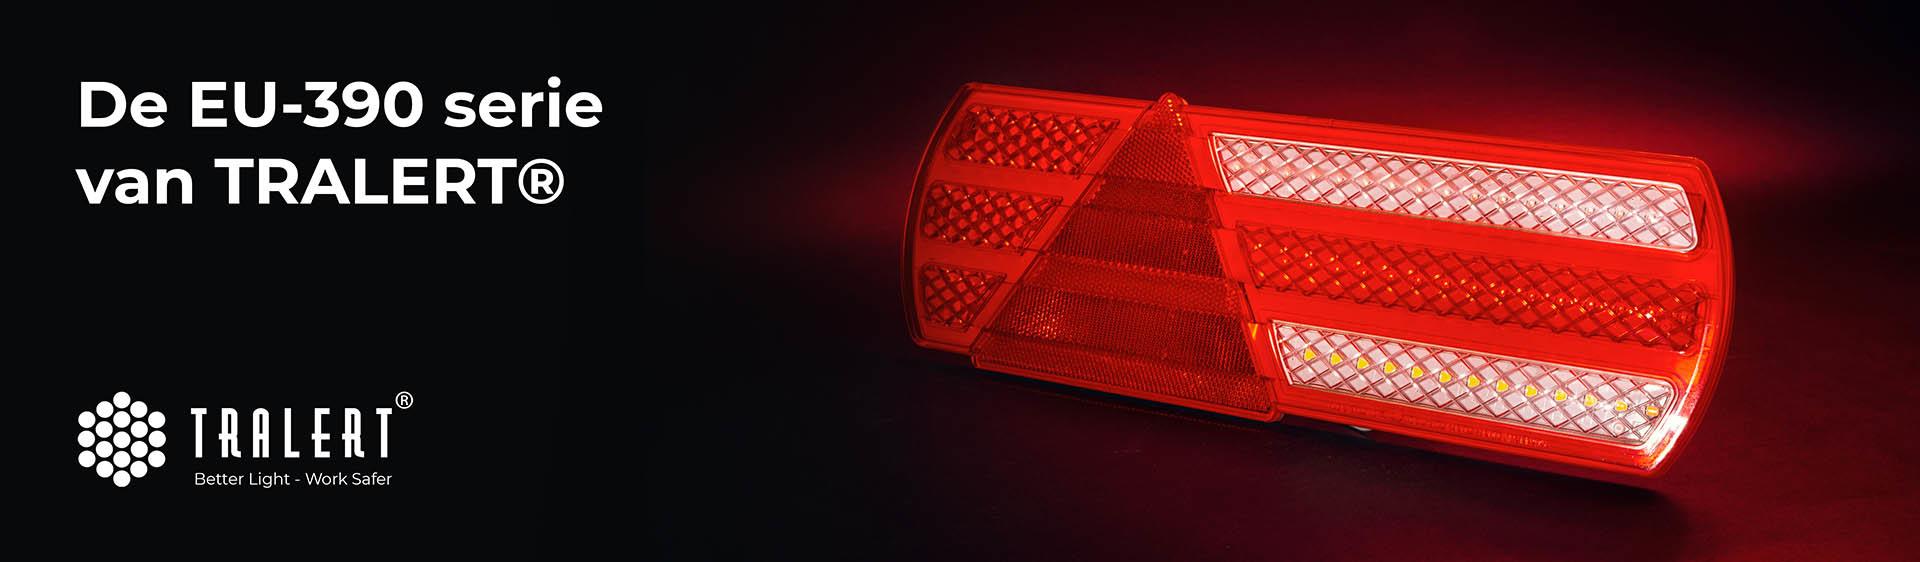 Tralert EU390-serie LED achterlicht banner